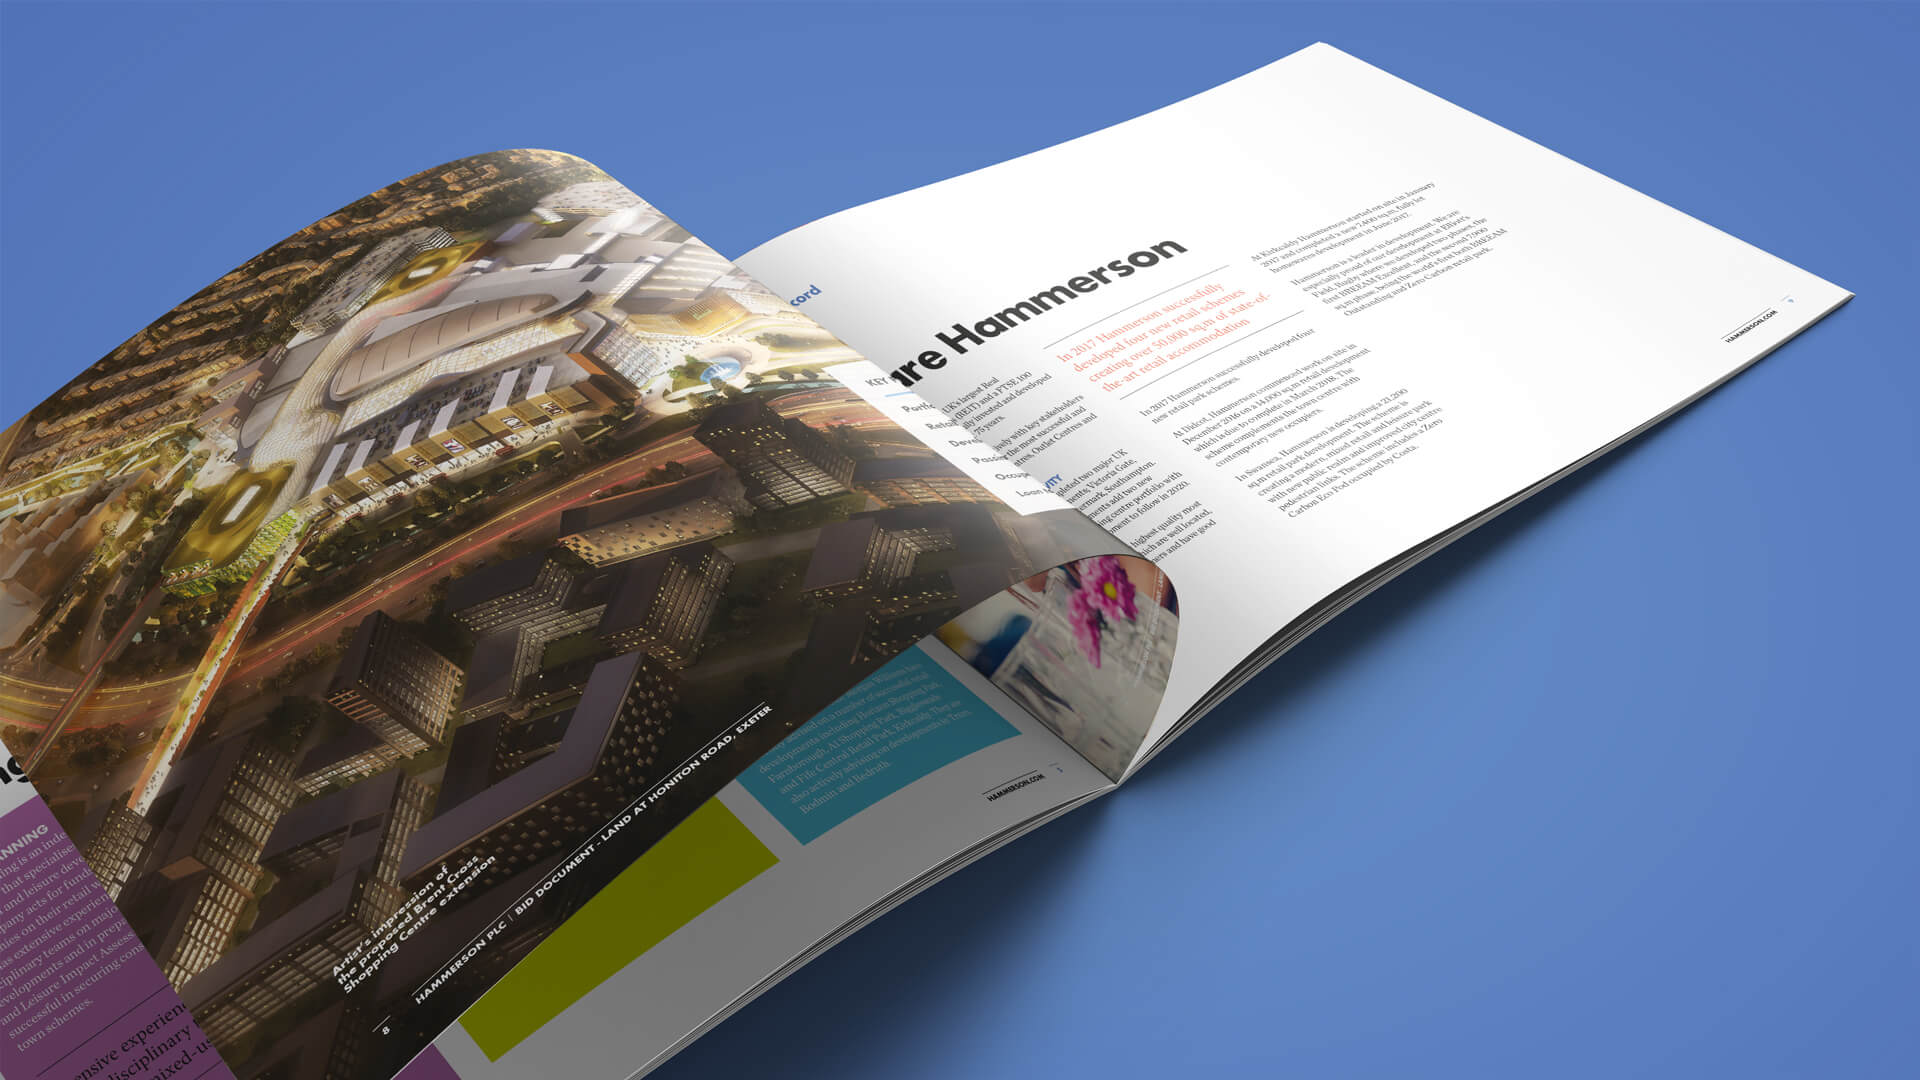 Hammerson - Marketing brochures & hoardings